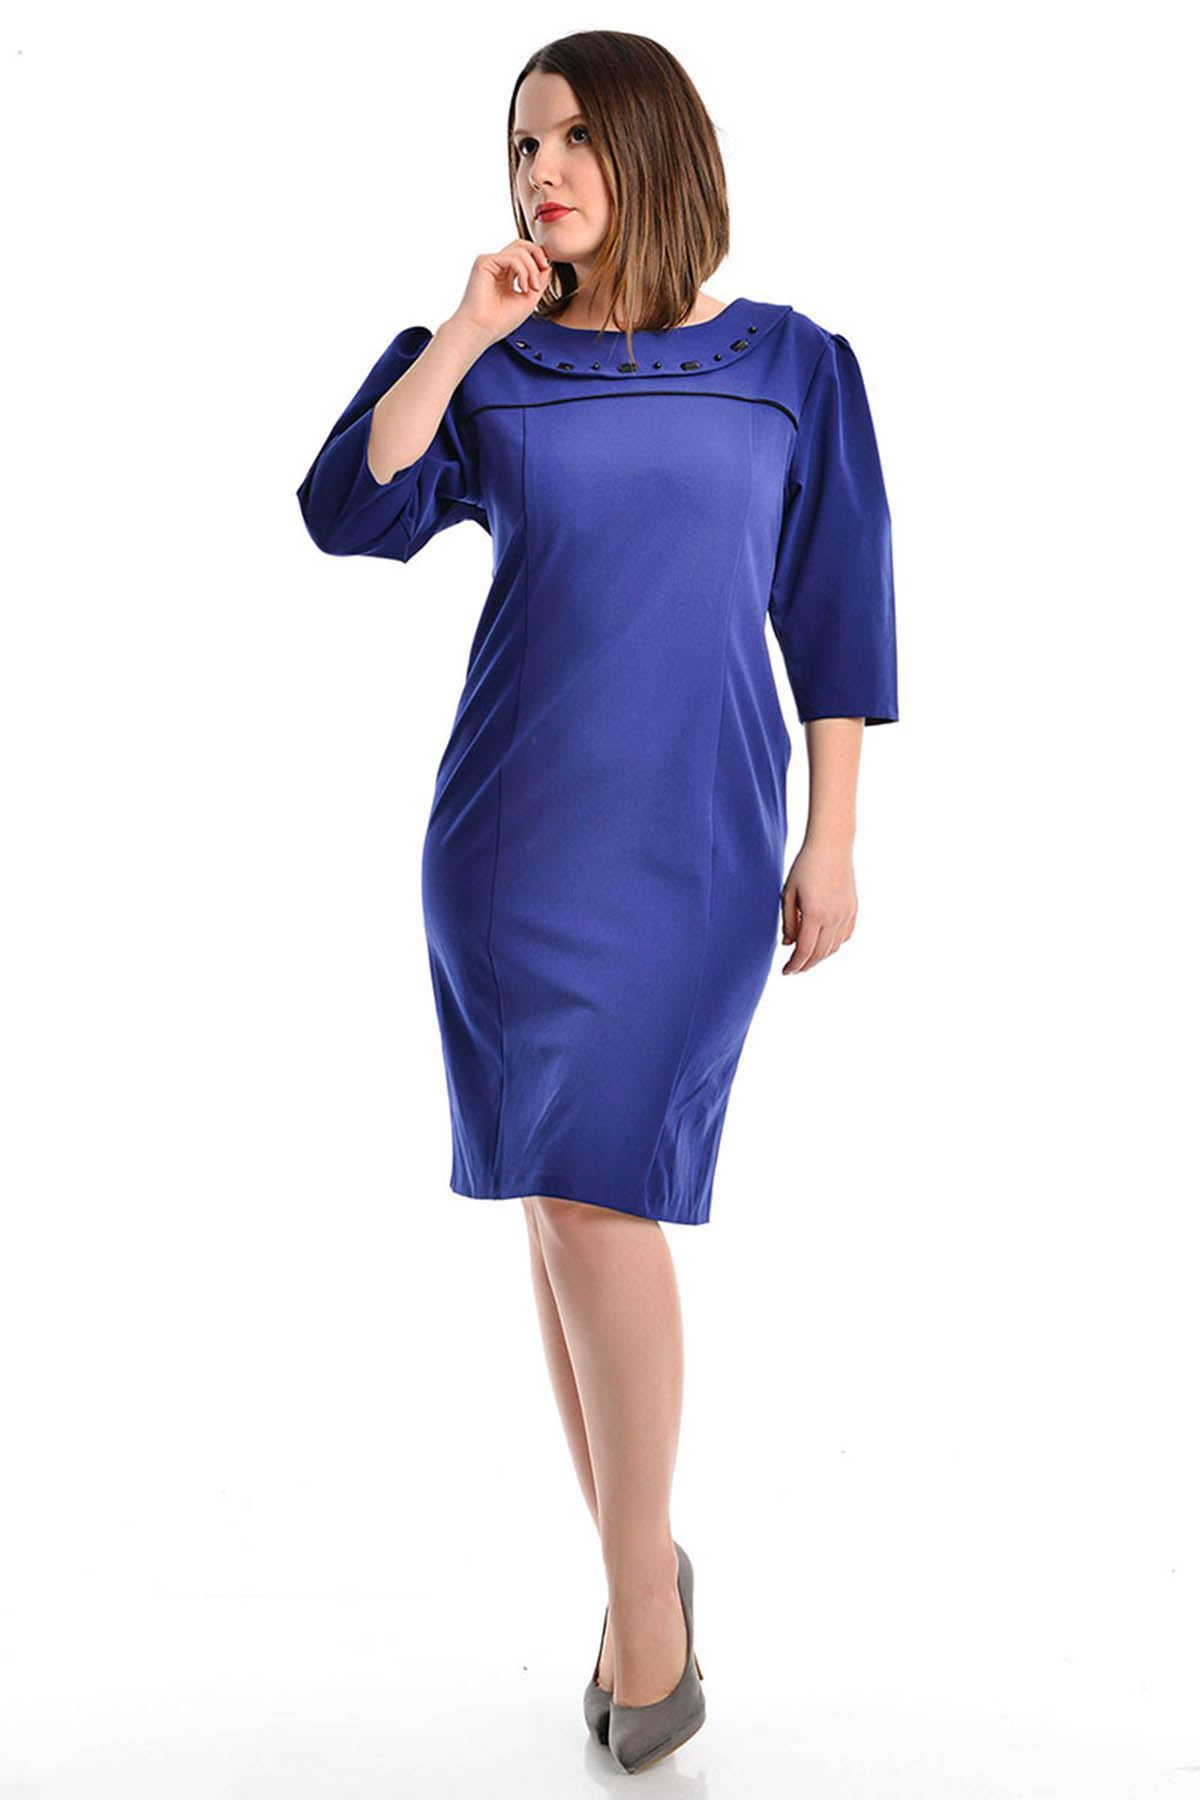 Saks Mavisi Yaka Taşlı  Elbise F12-111852